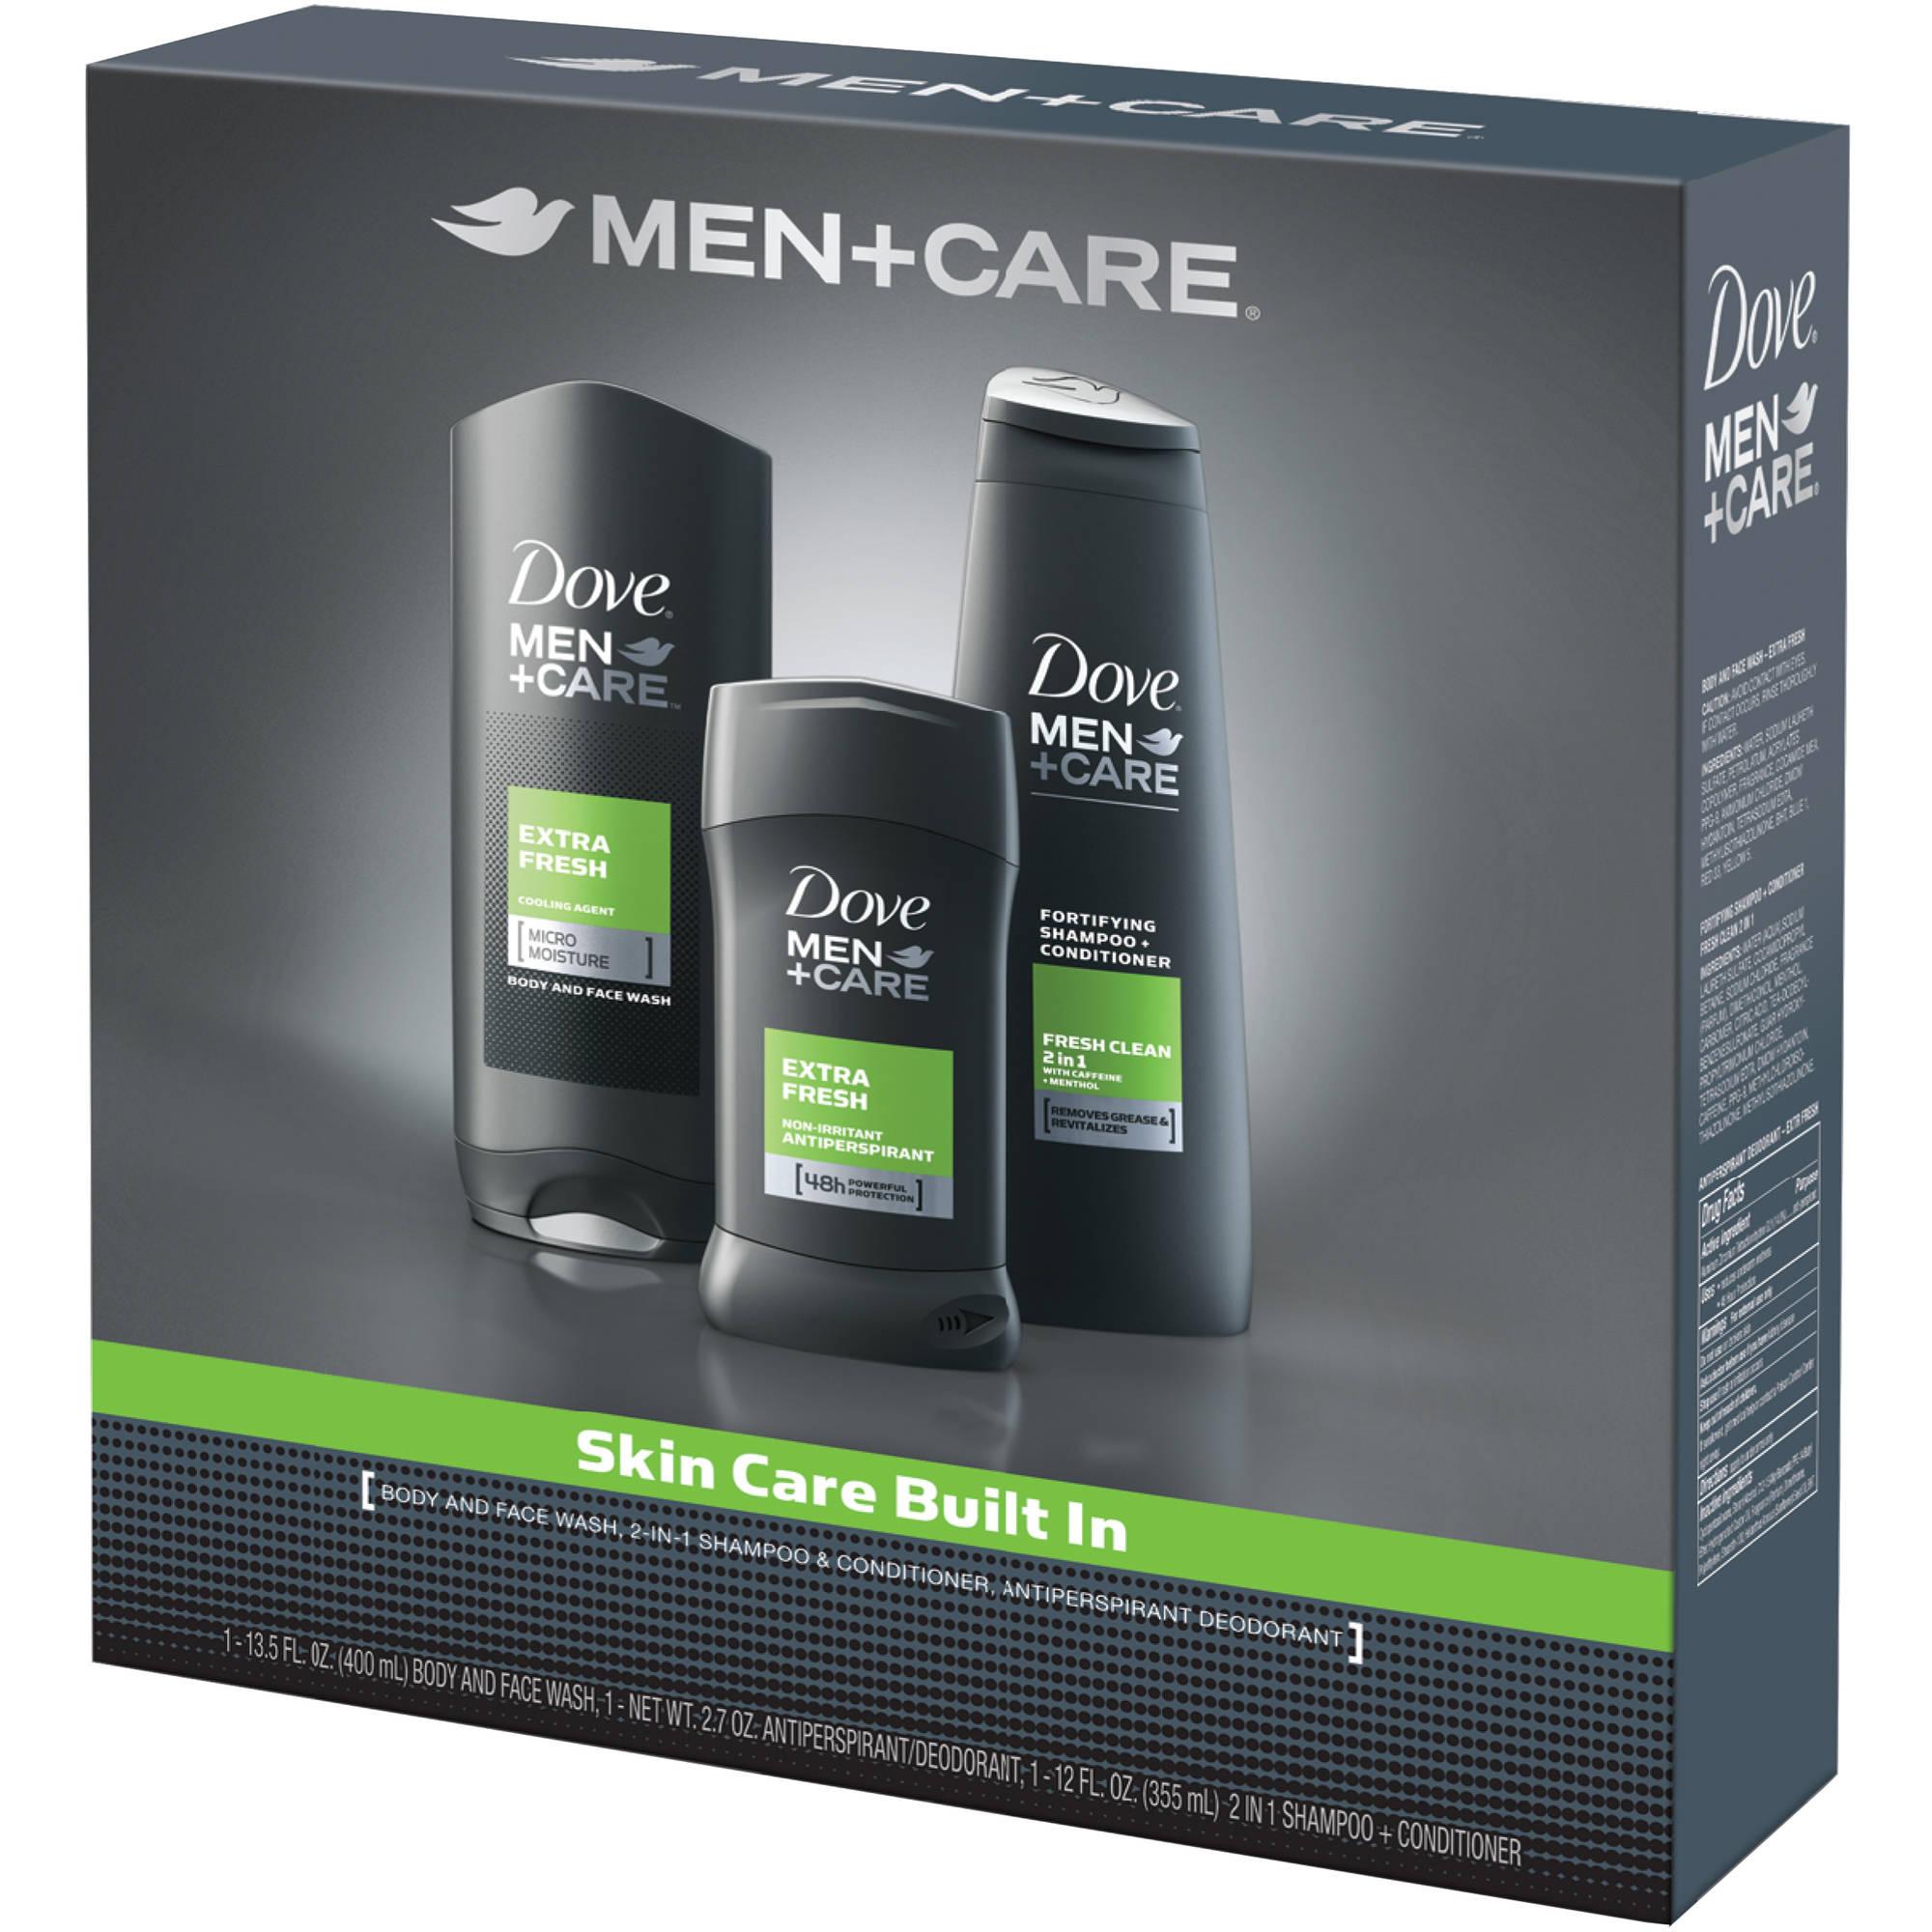 Dove Men + Care Extra Fresh Hygiene Kit, 3 pc - Walmart.com